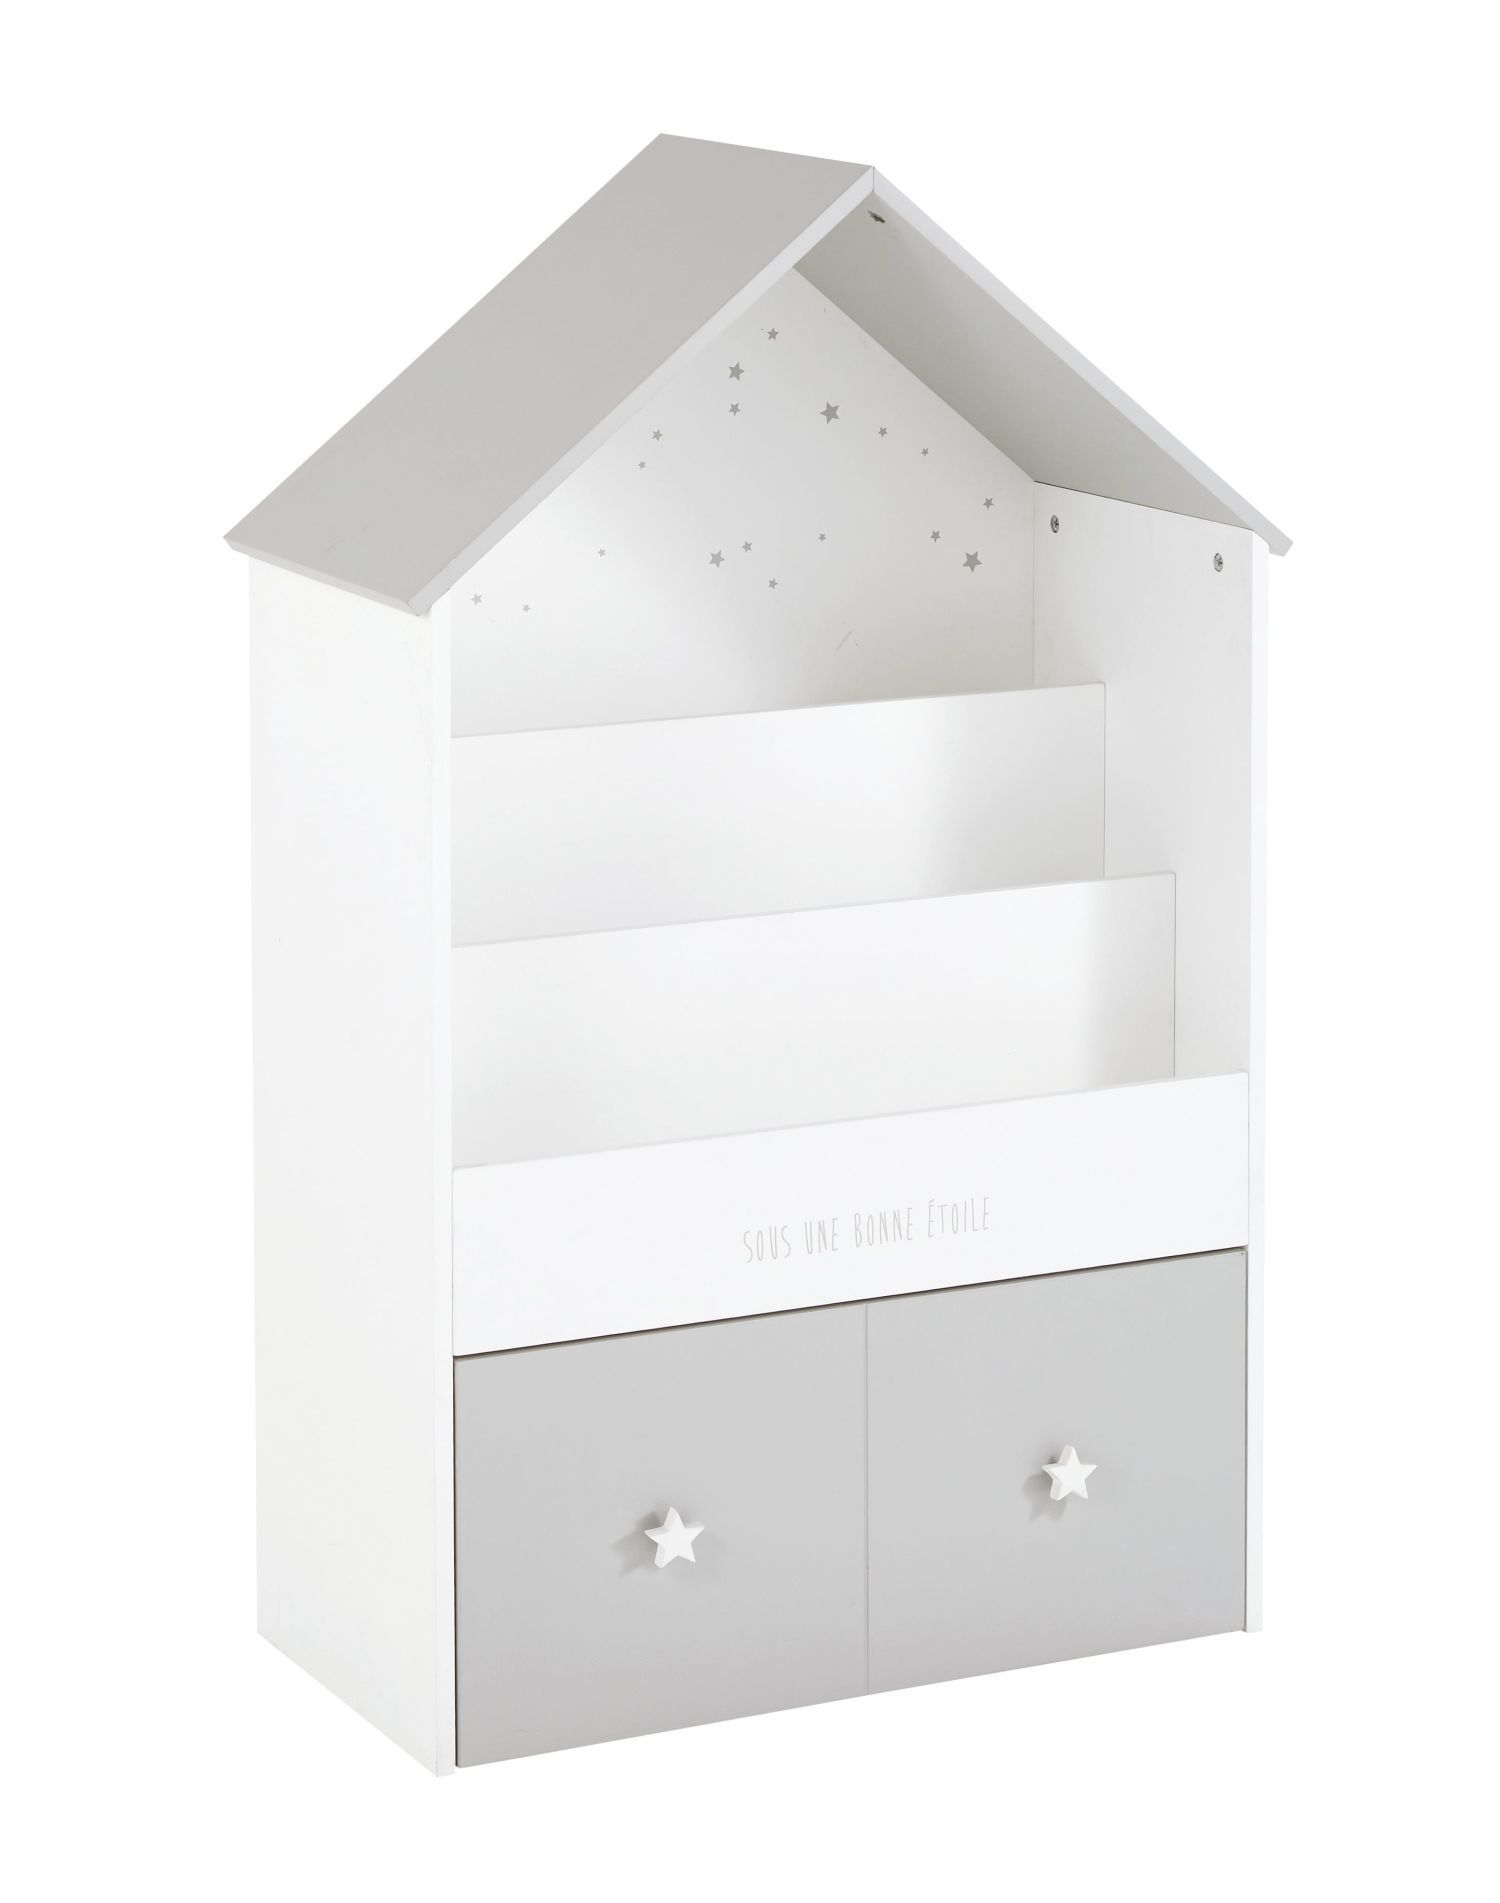 b cherregal in hausform f r kinder grau und wei in 2019. Black Bedroom Furniture Sets. Home Design Ideas